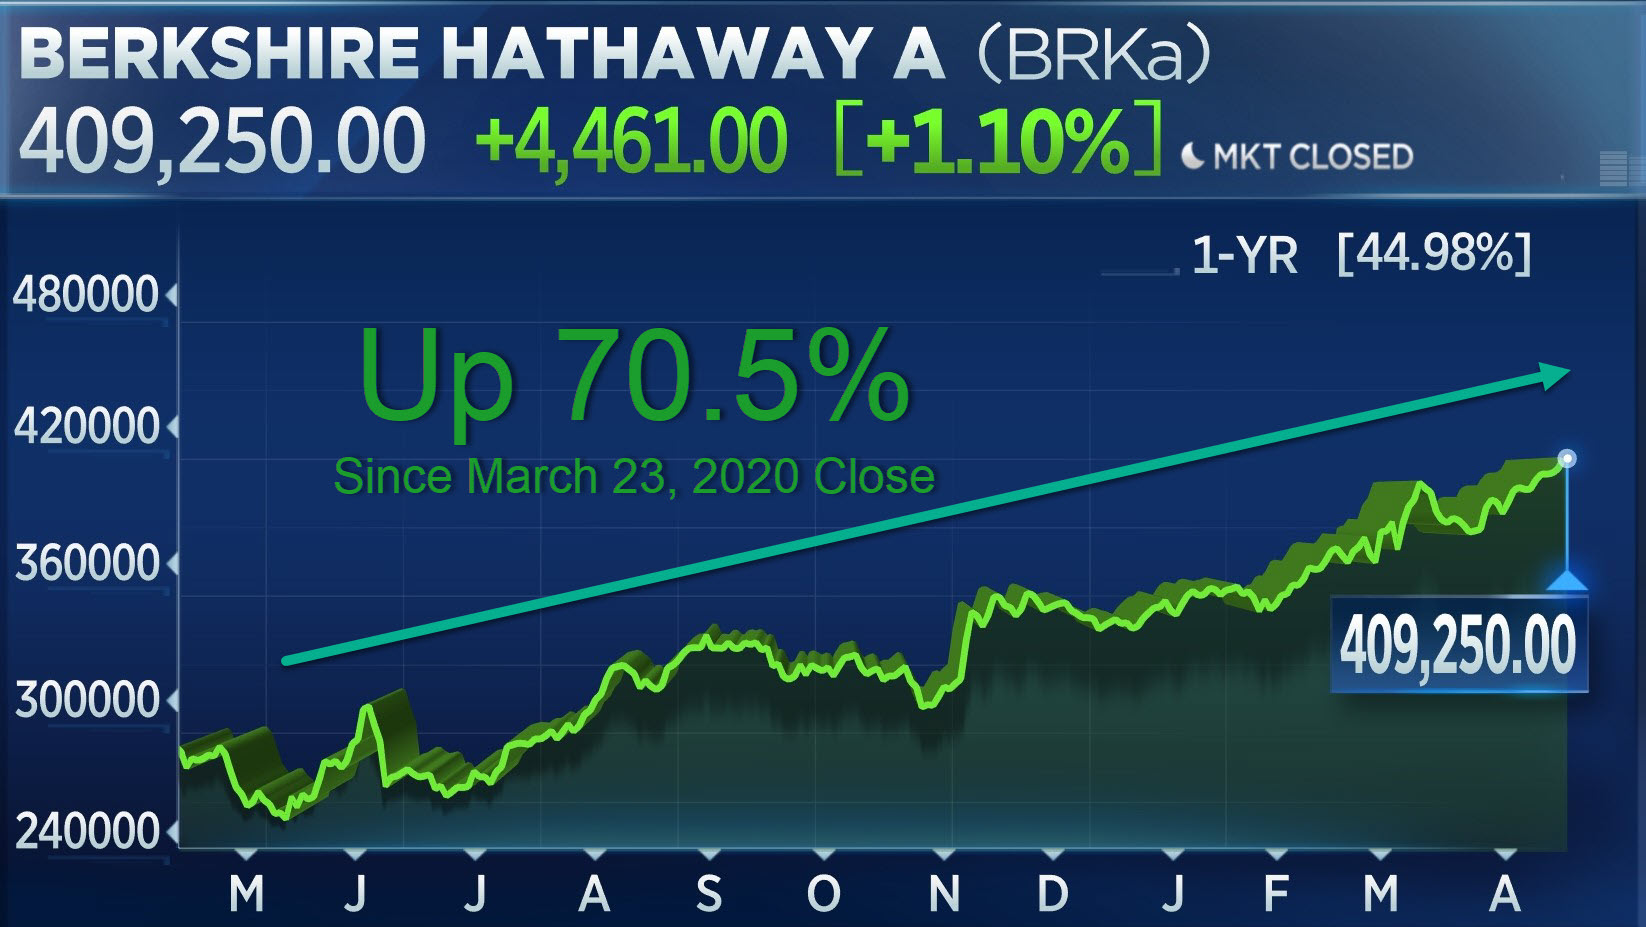 Berkshire Hathaway Class A shares 1-year chart